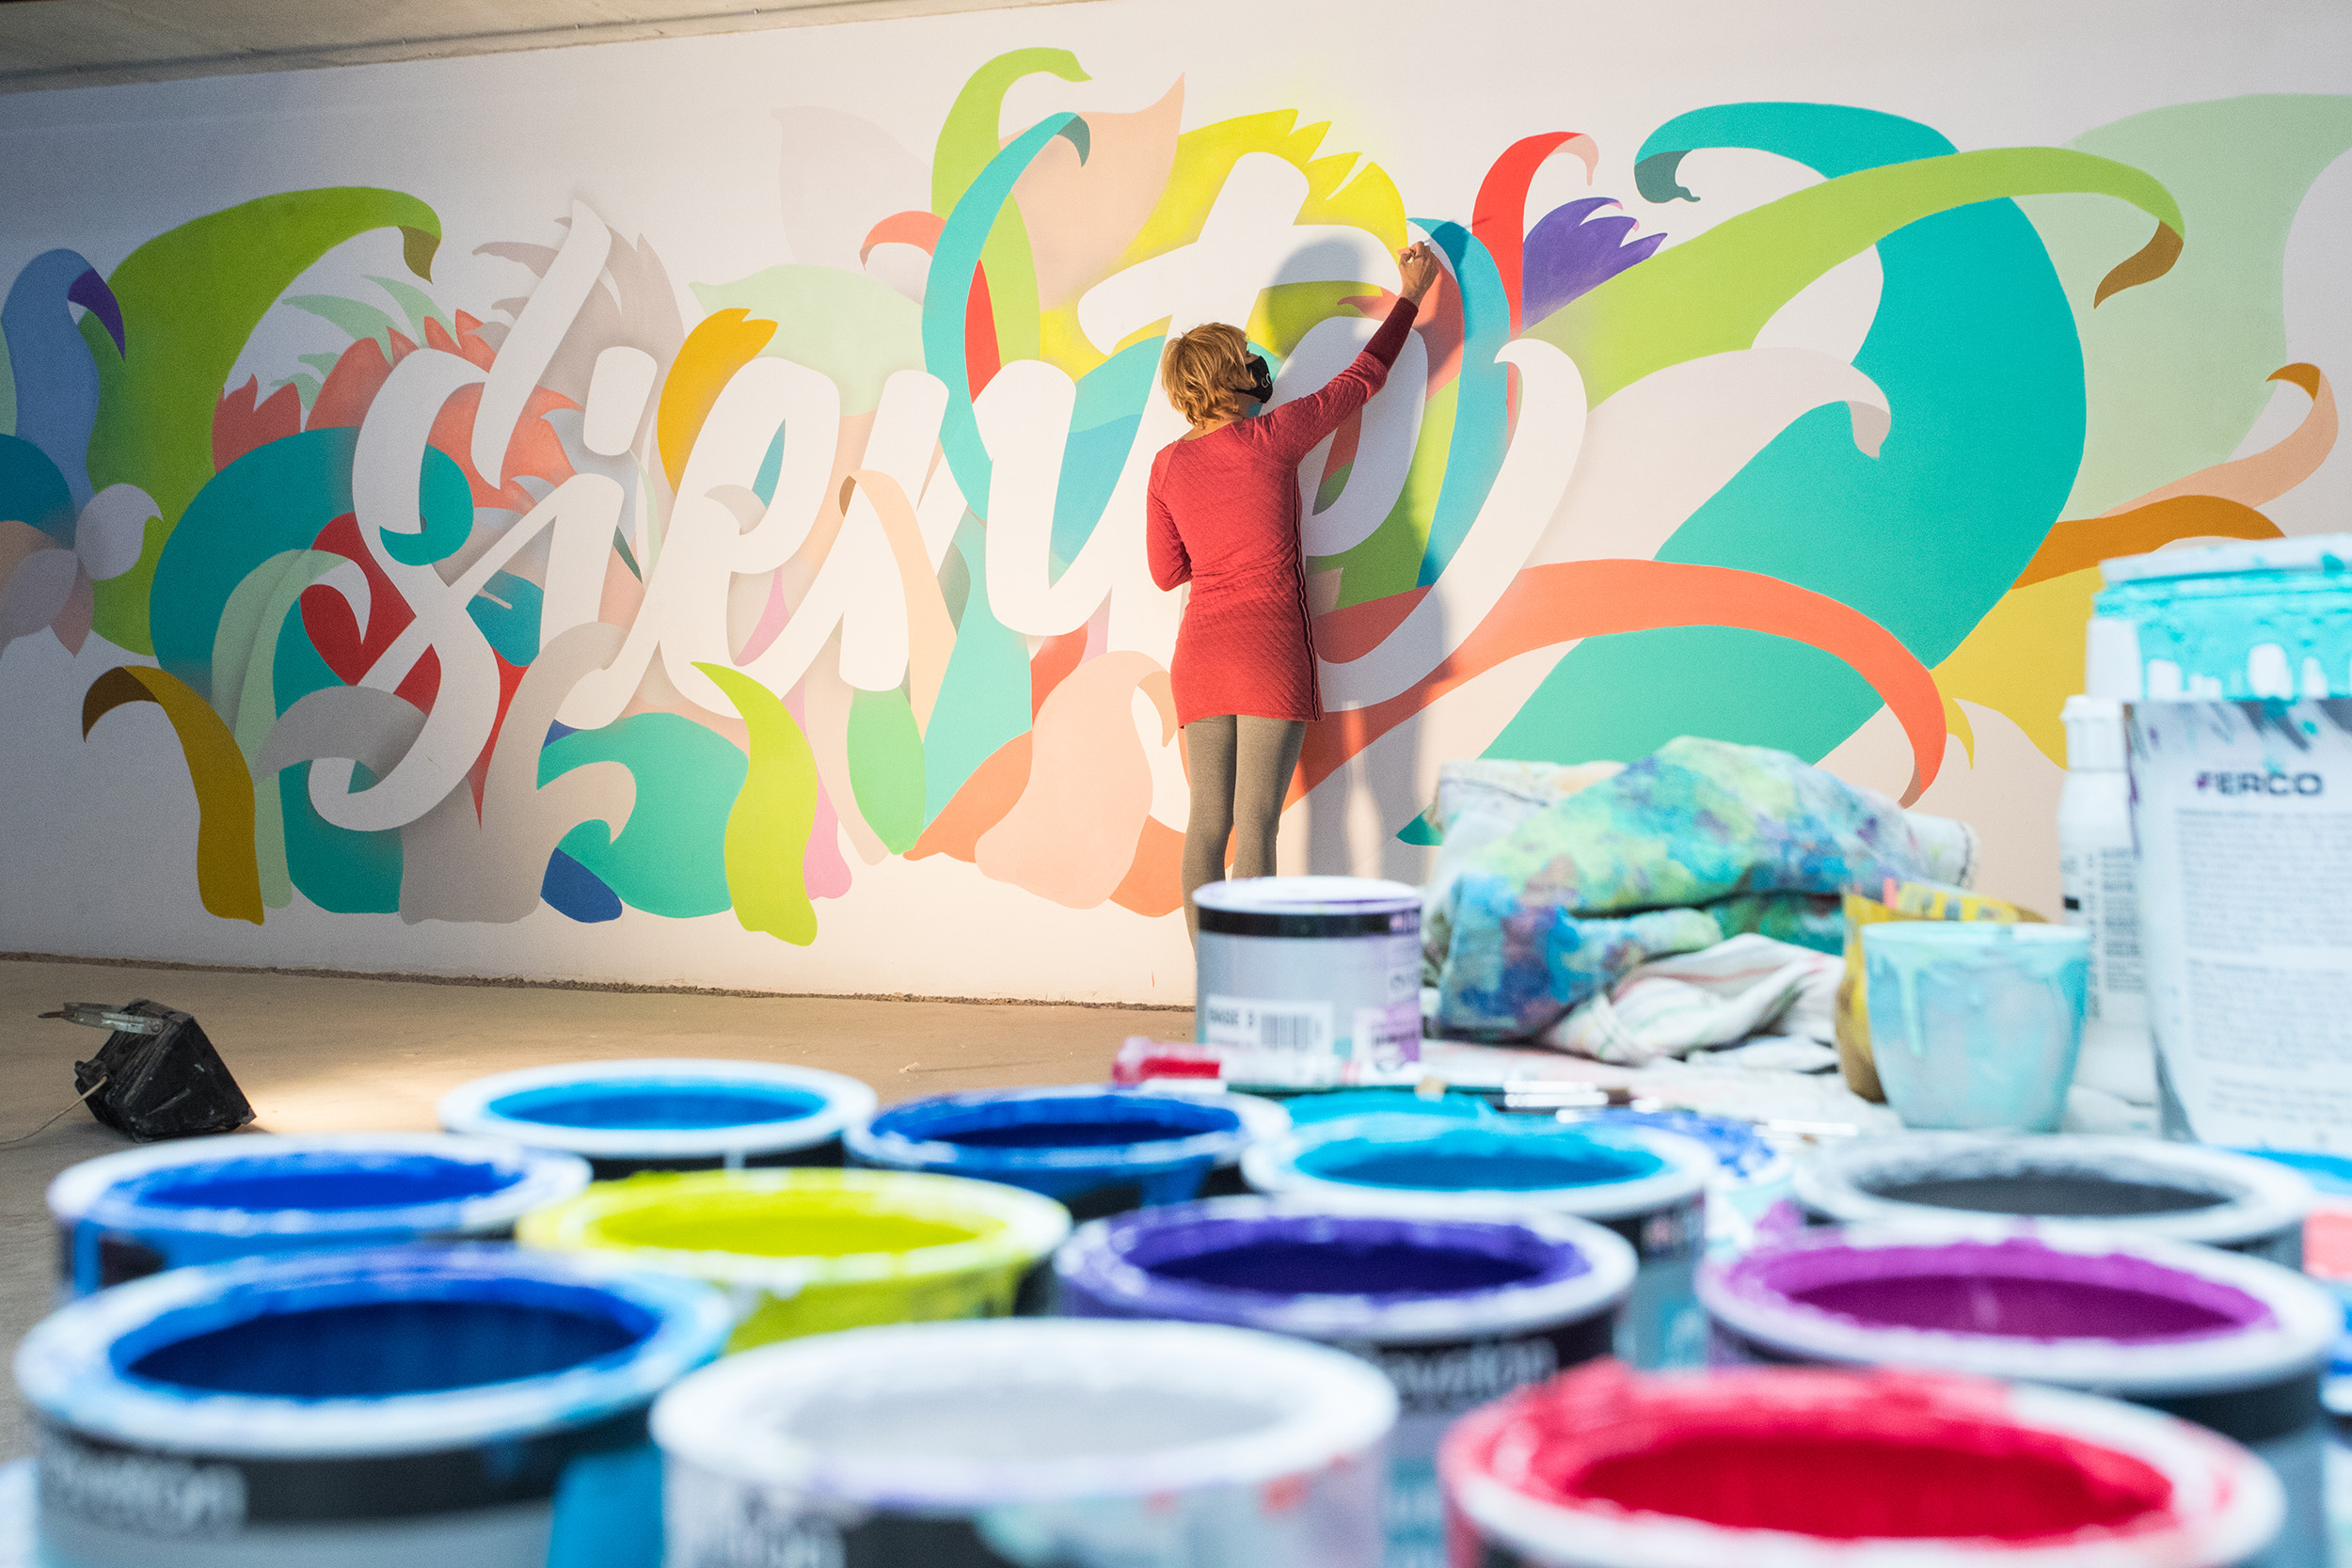 Noe pintando el mural Siente en Residencial Novelty Plaza, de Aransa